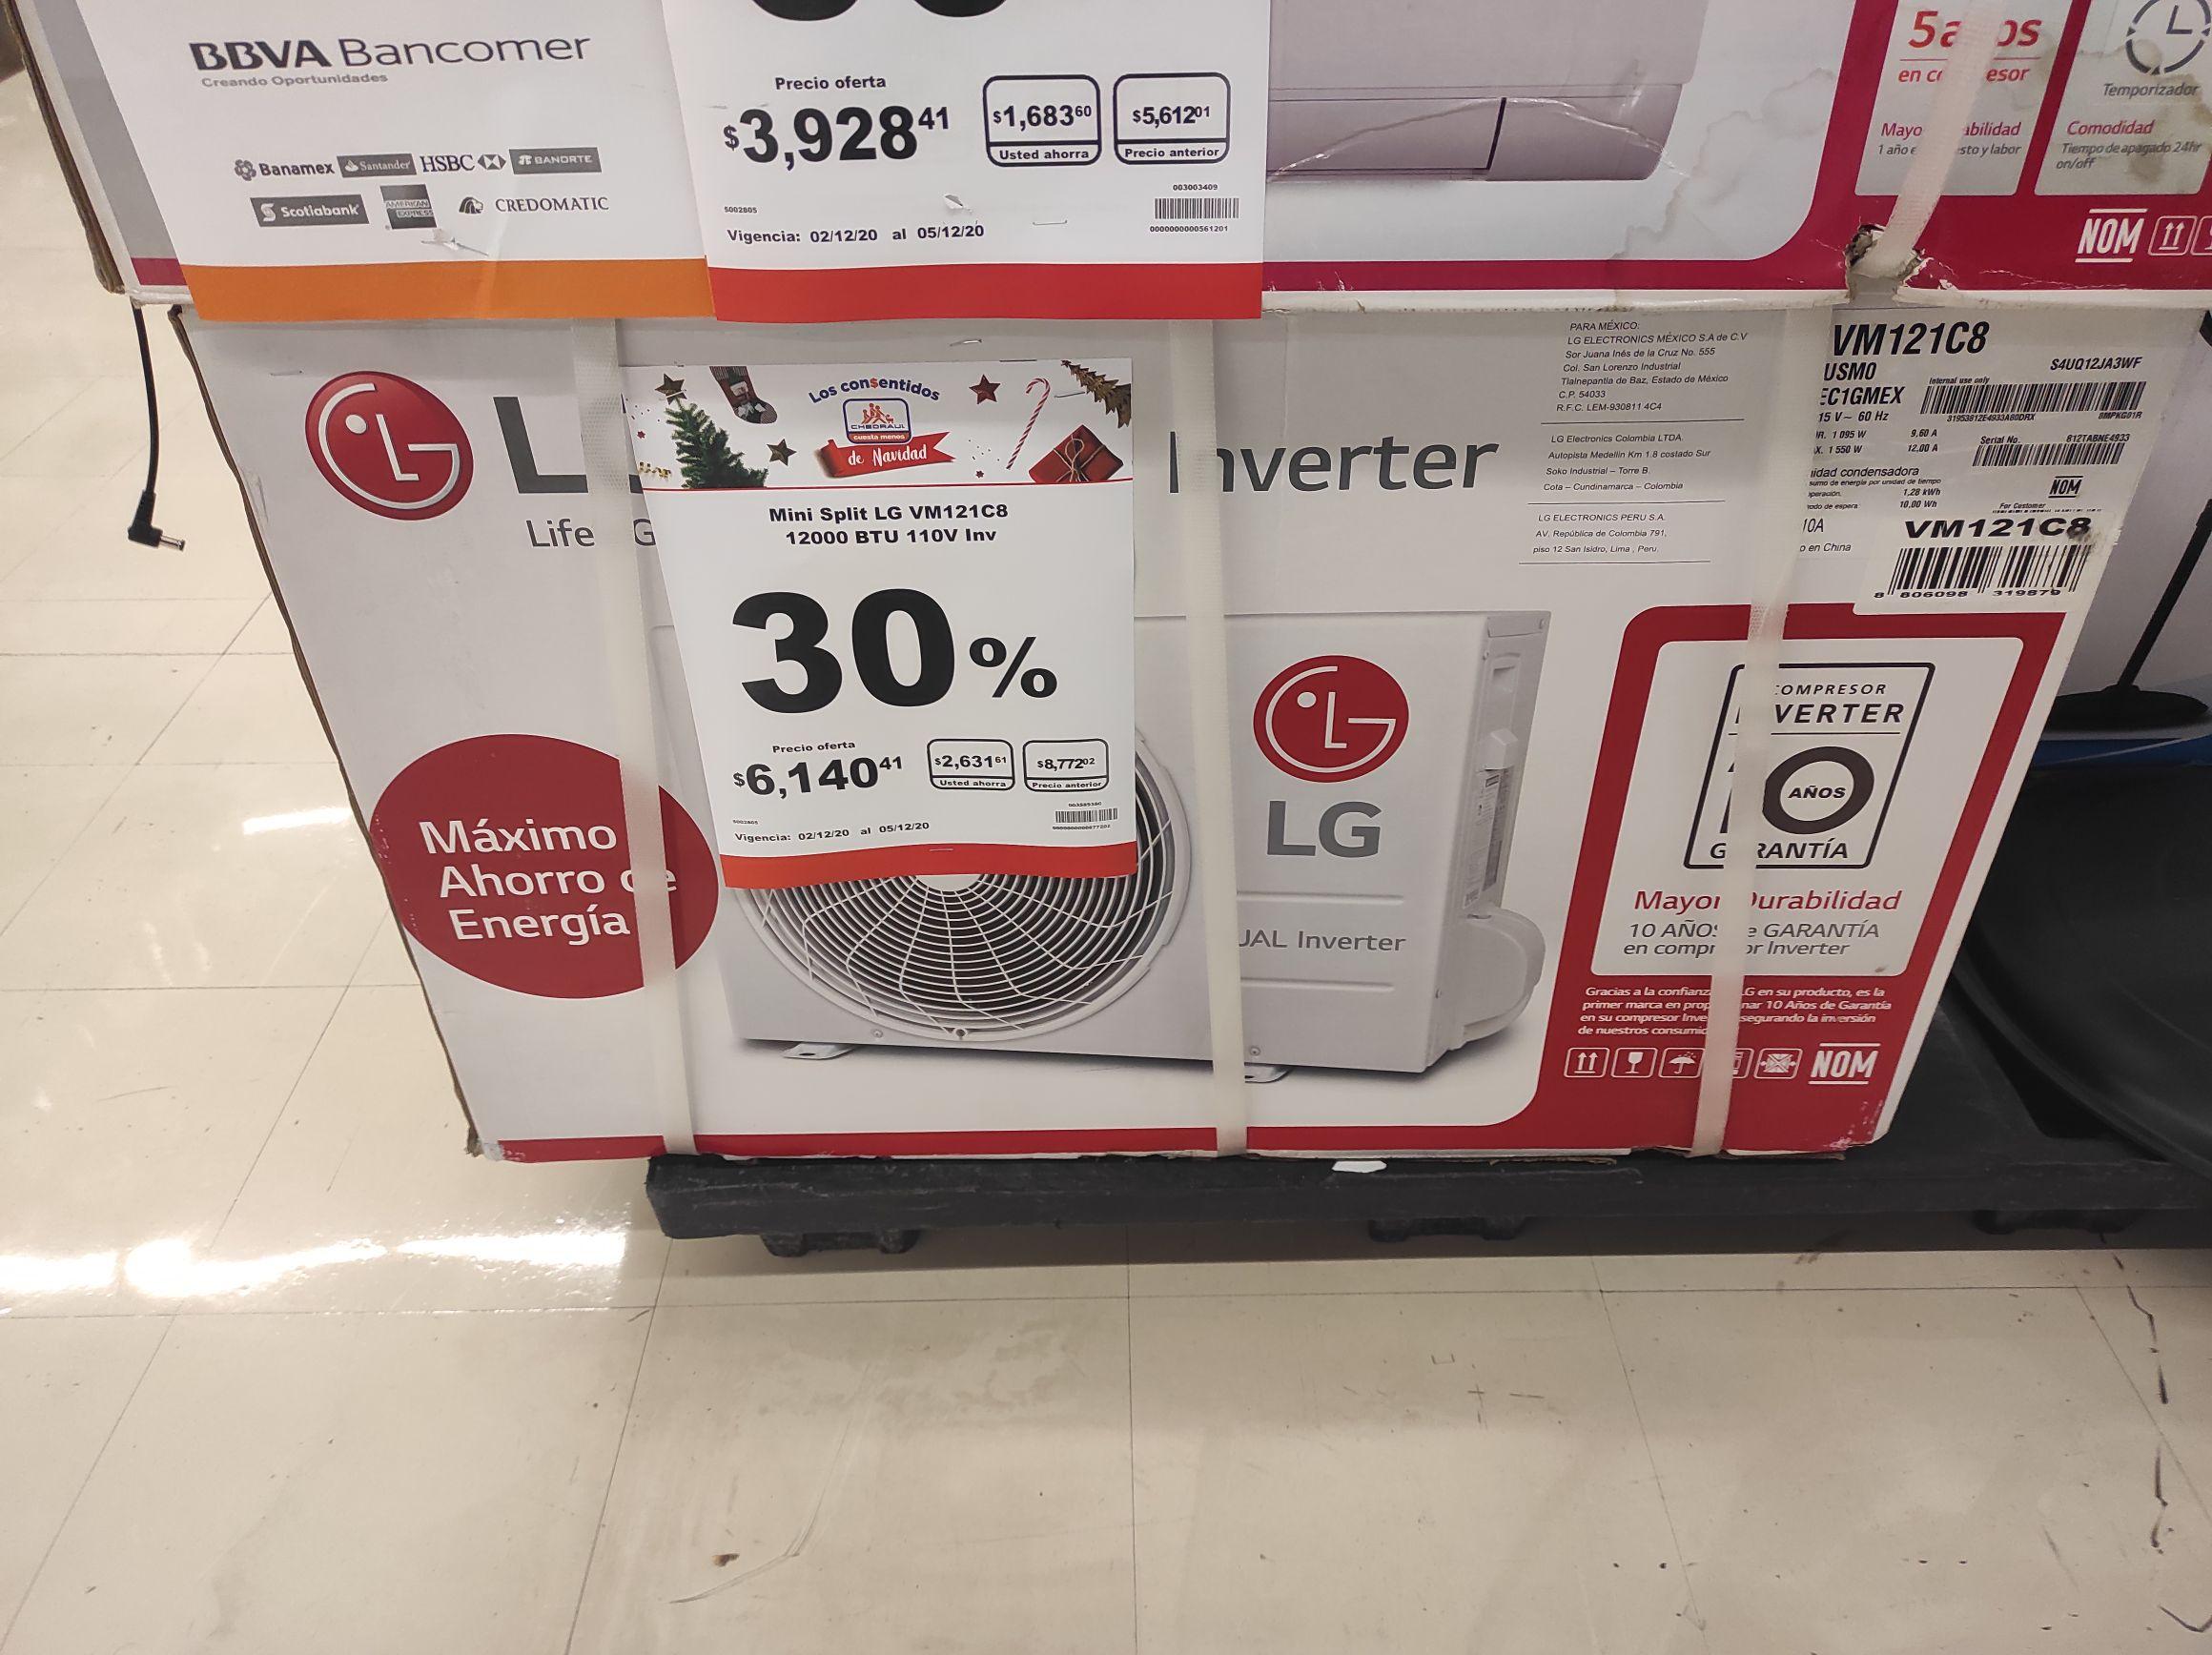 Chedraui: Minisplit LG dual inverter VM121C8